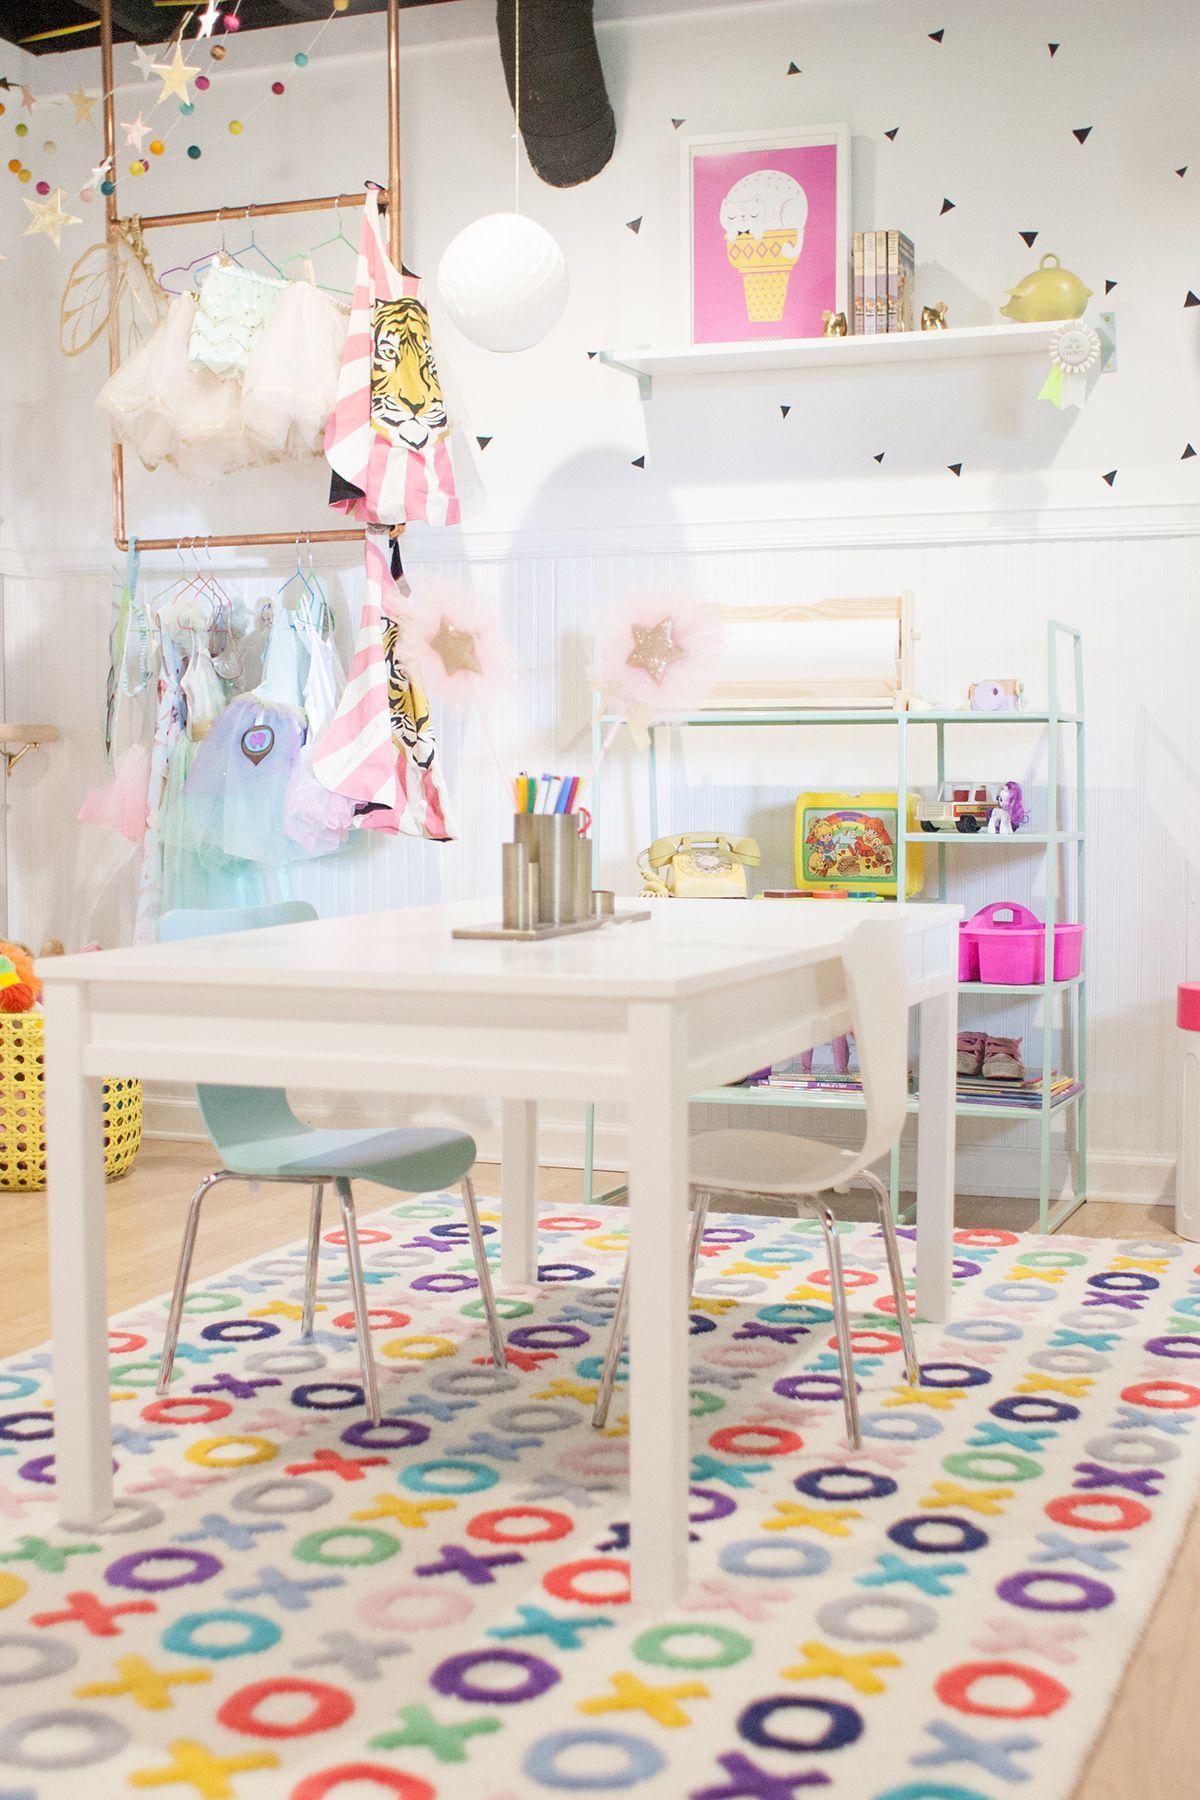 A Playroom For Girls Kid Room Decor Modern Playroom Playroom Decor